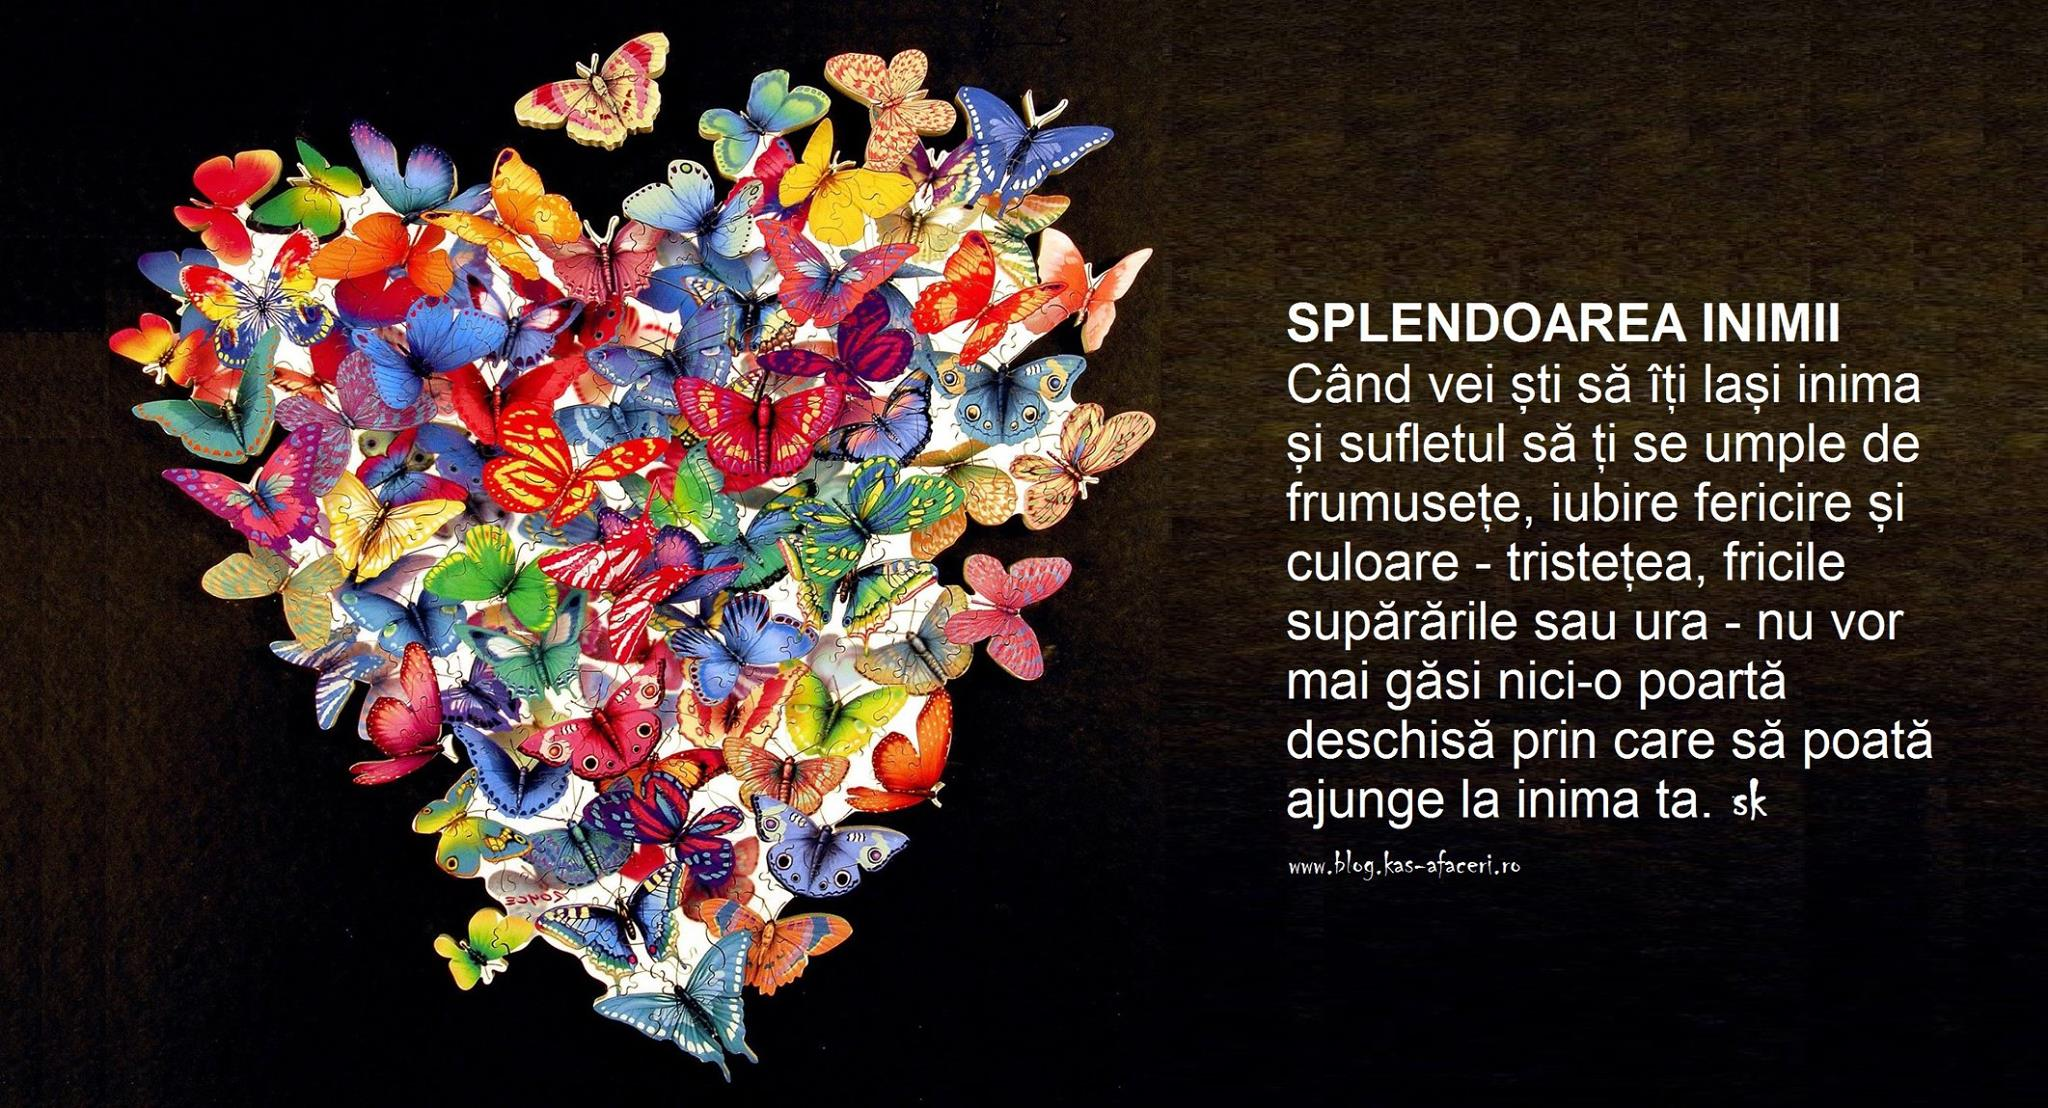 splendoarea inimii